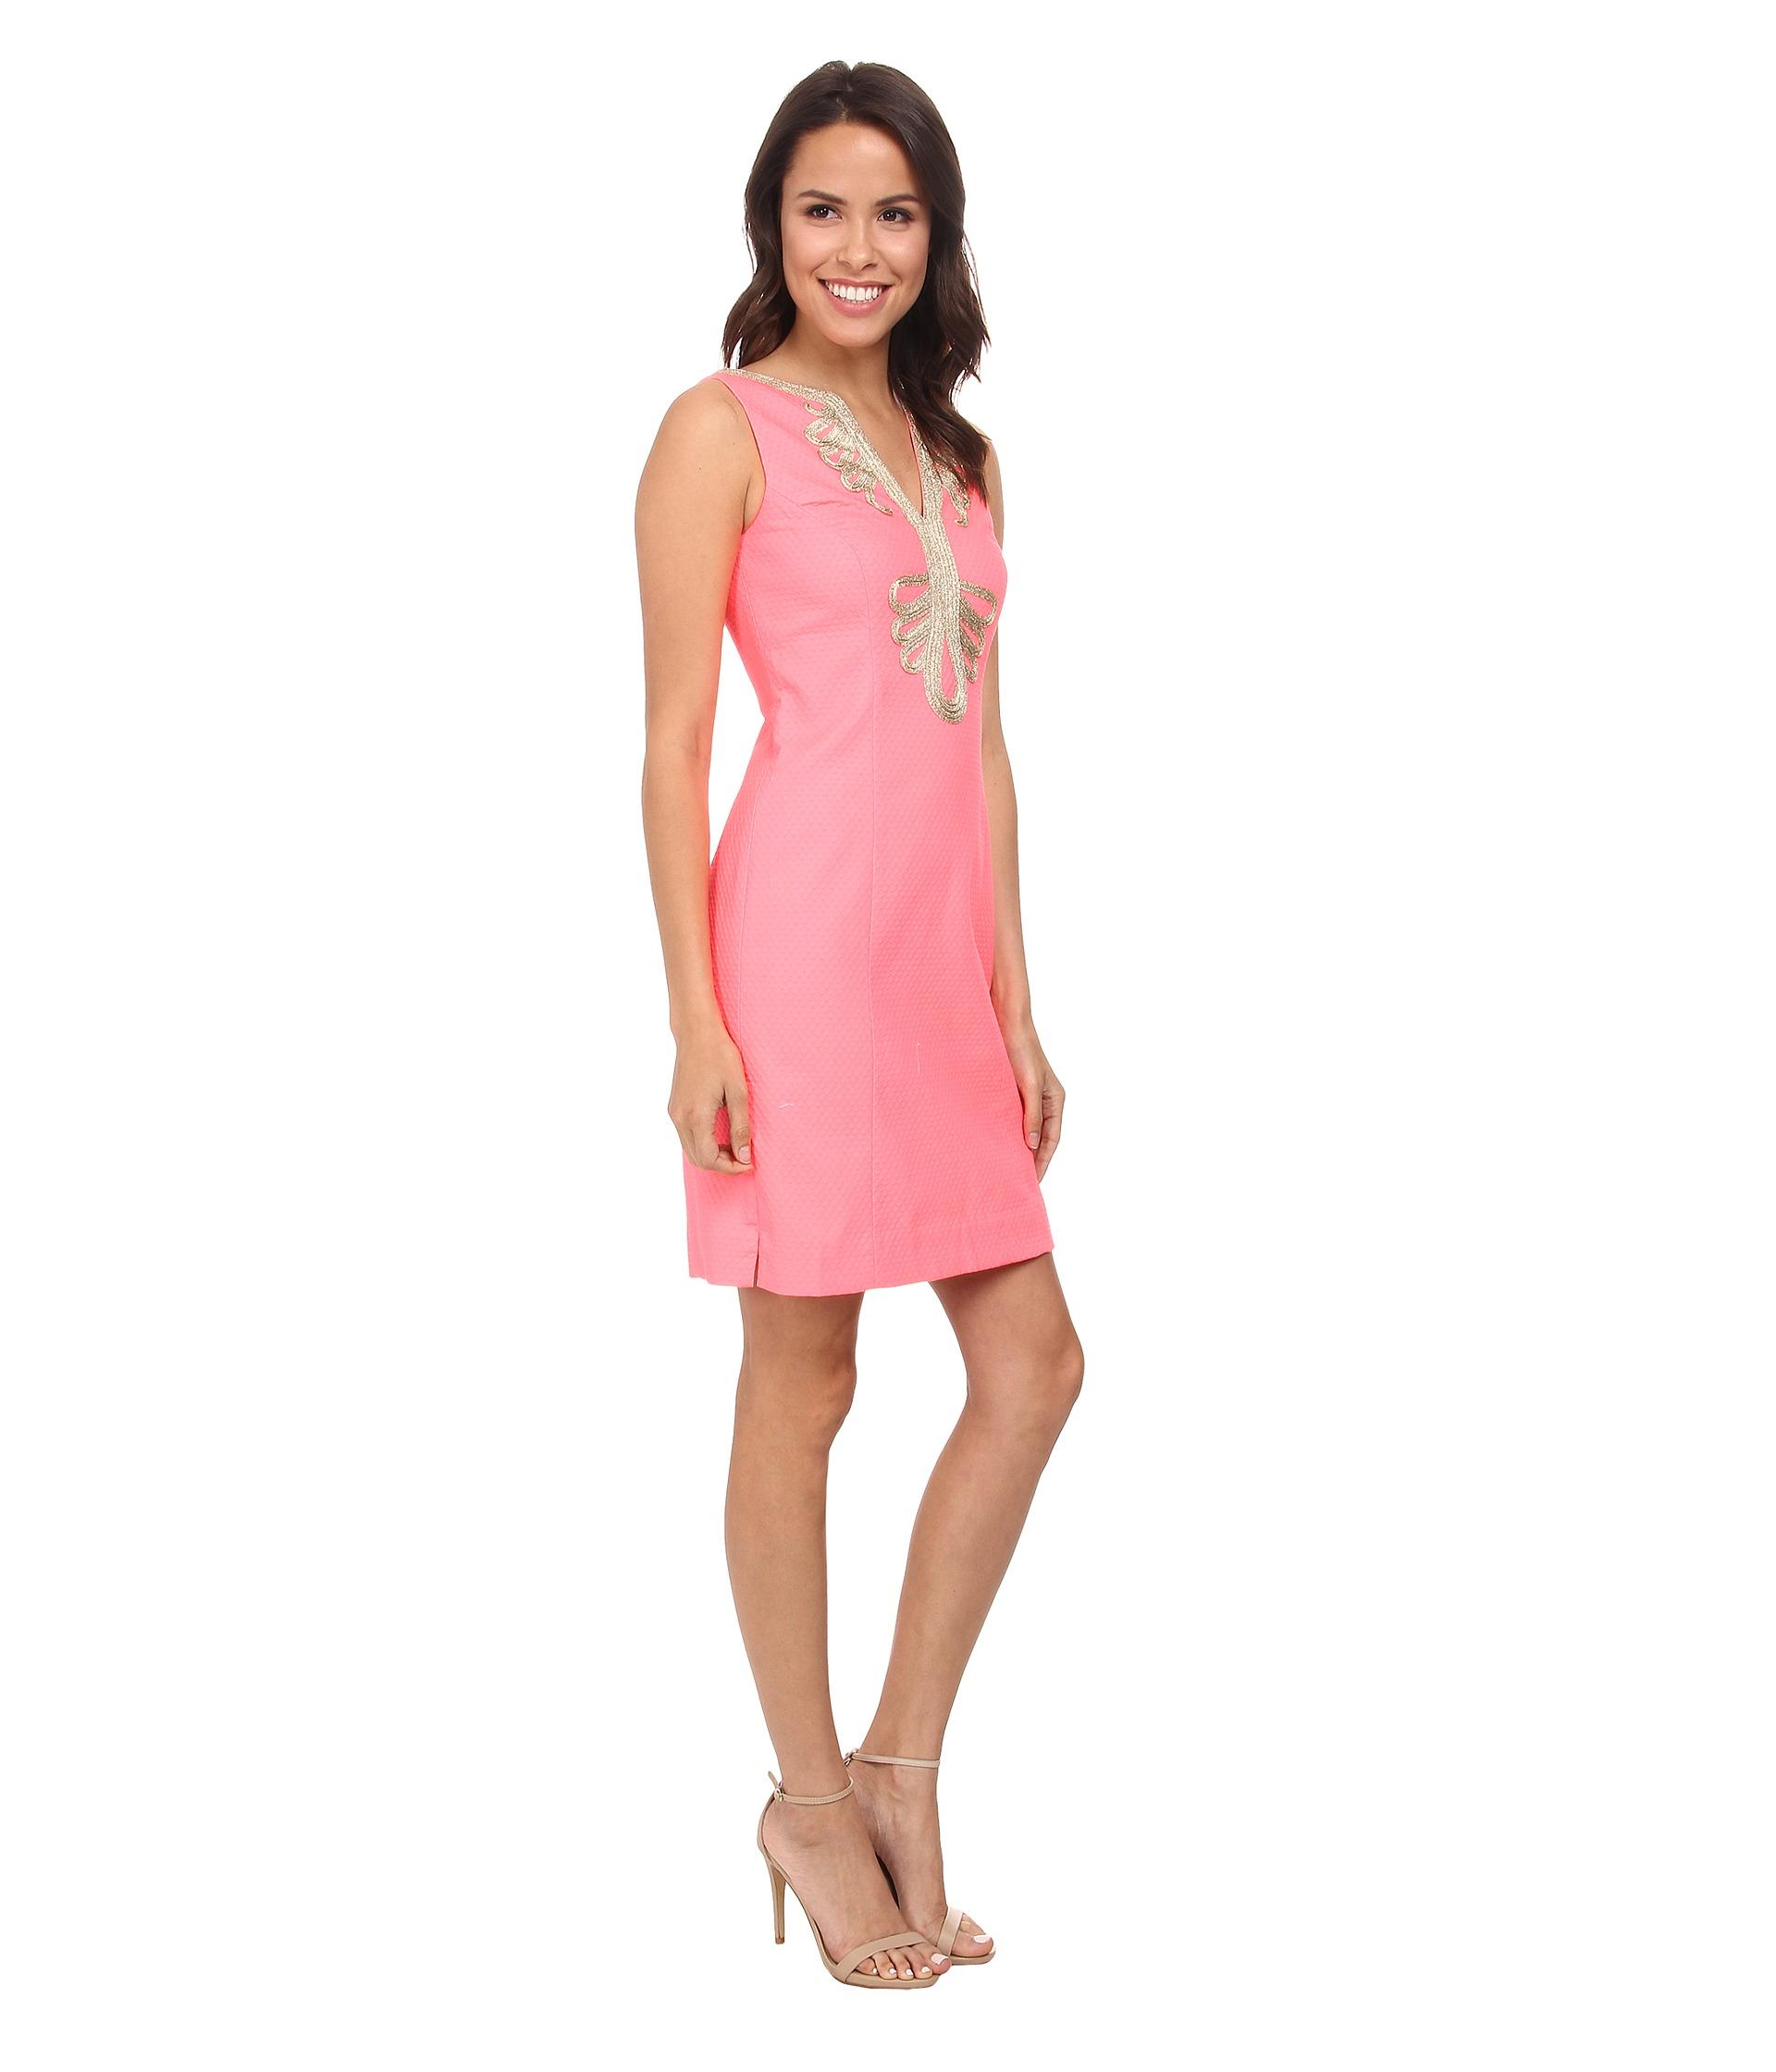 602872bfe8dc9 Women's Pink Janice Shift Dress